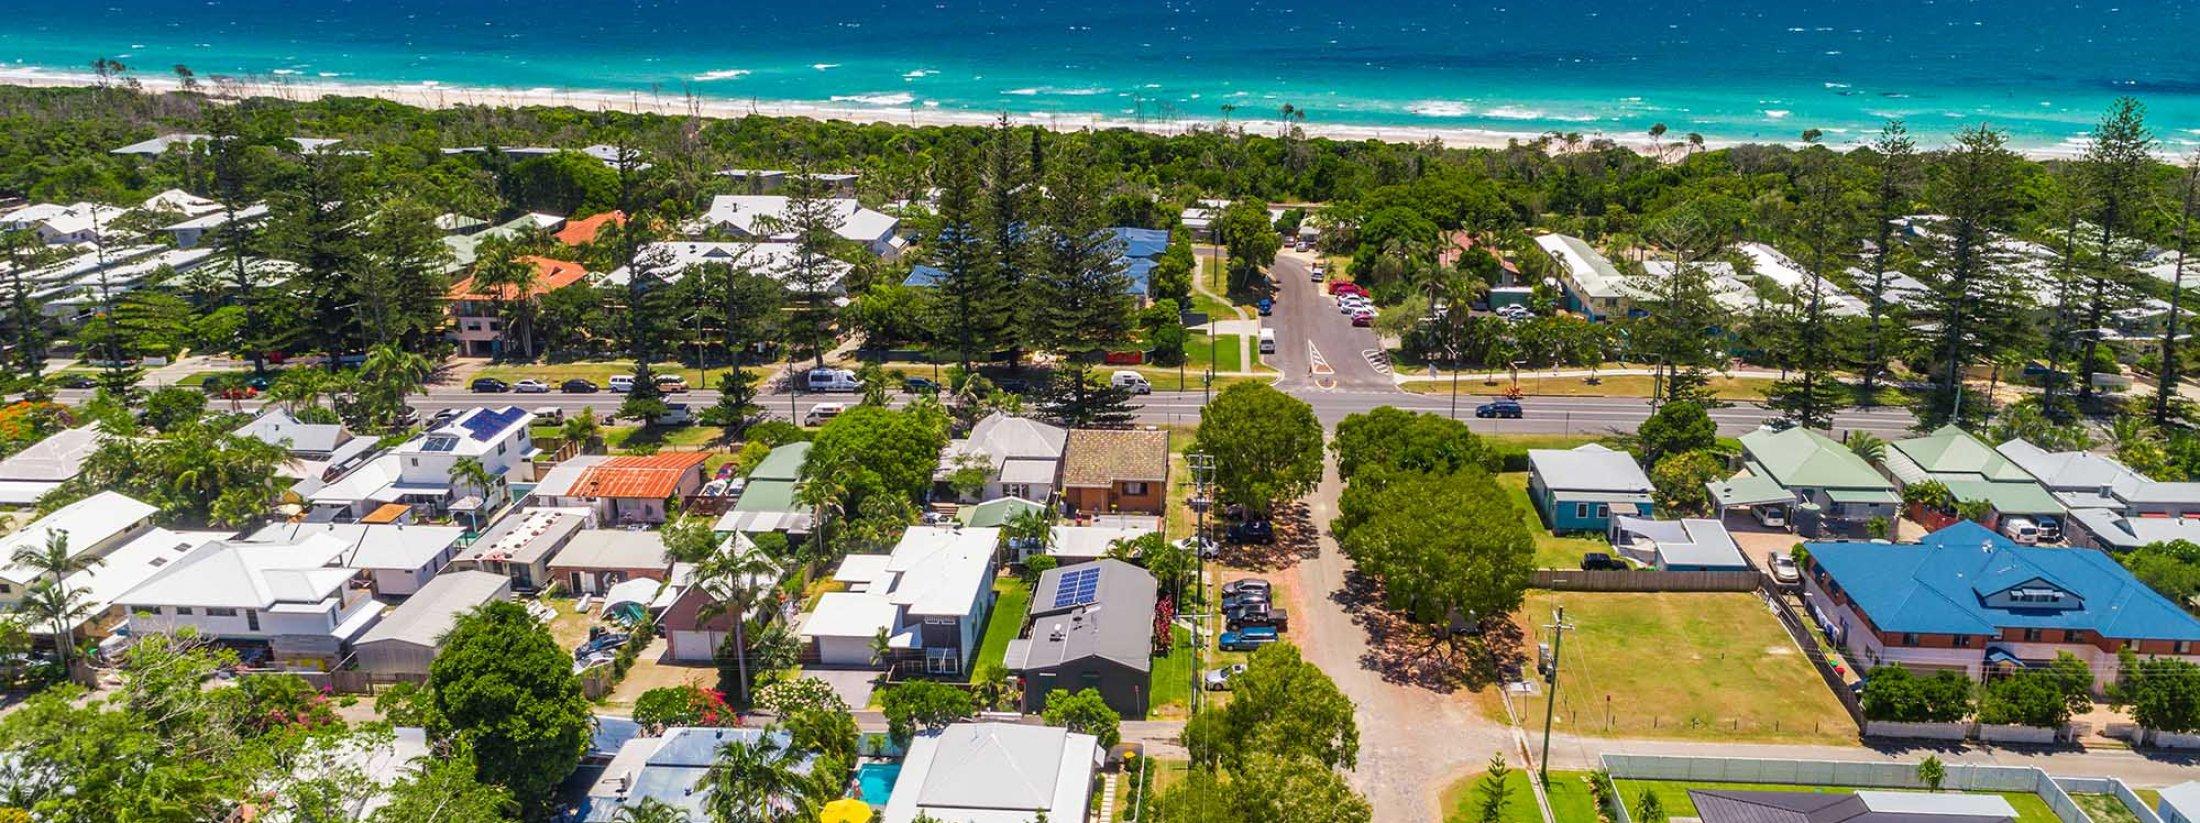 Aaloka Bay - Byron Bay - Aerial image towards beach b